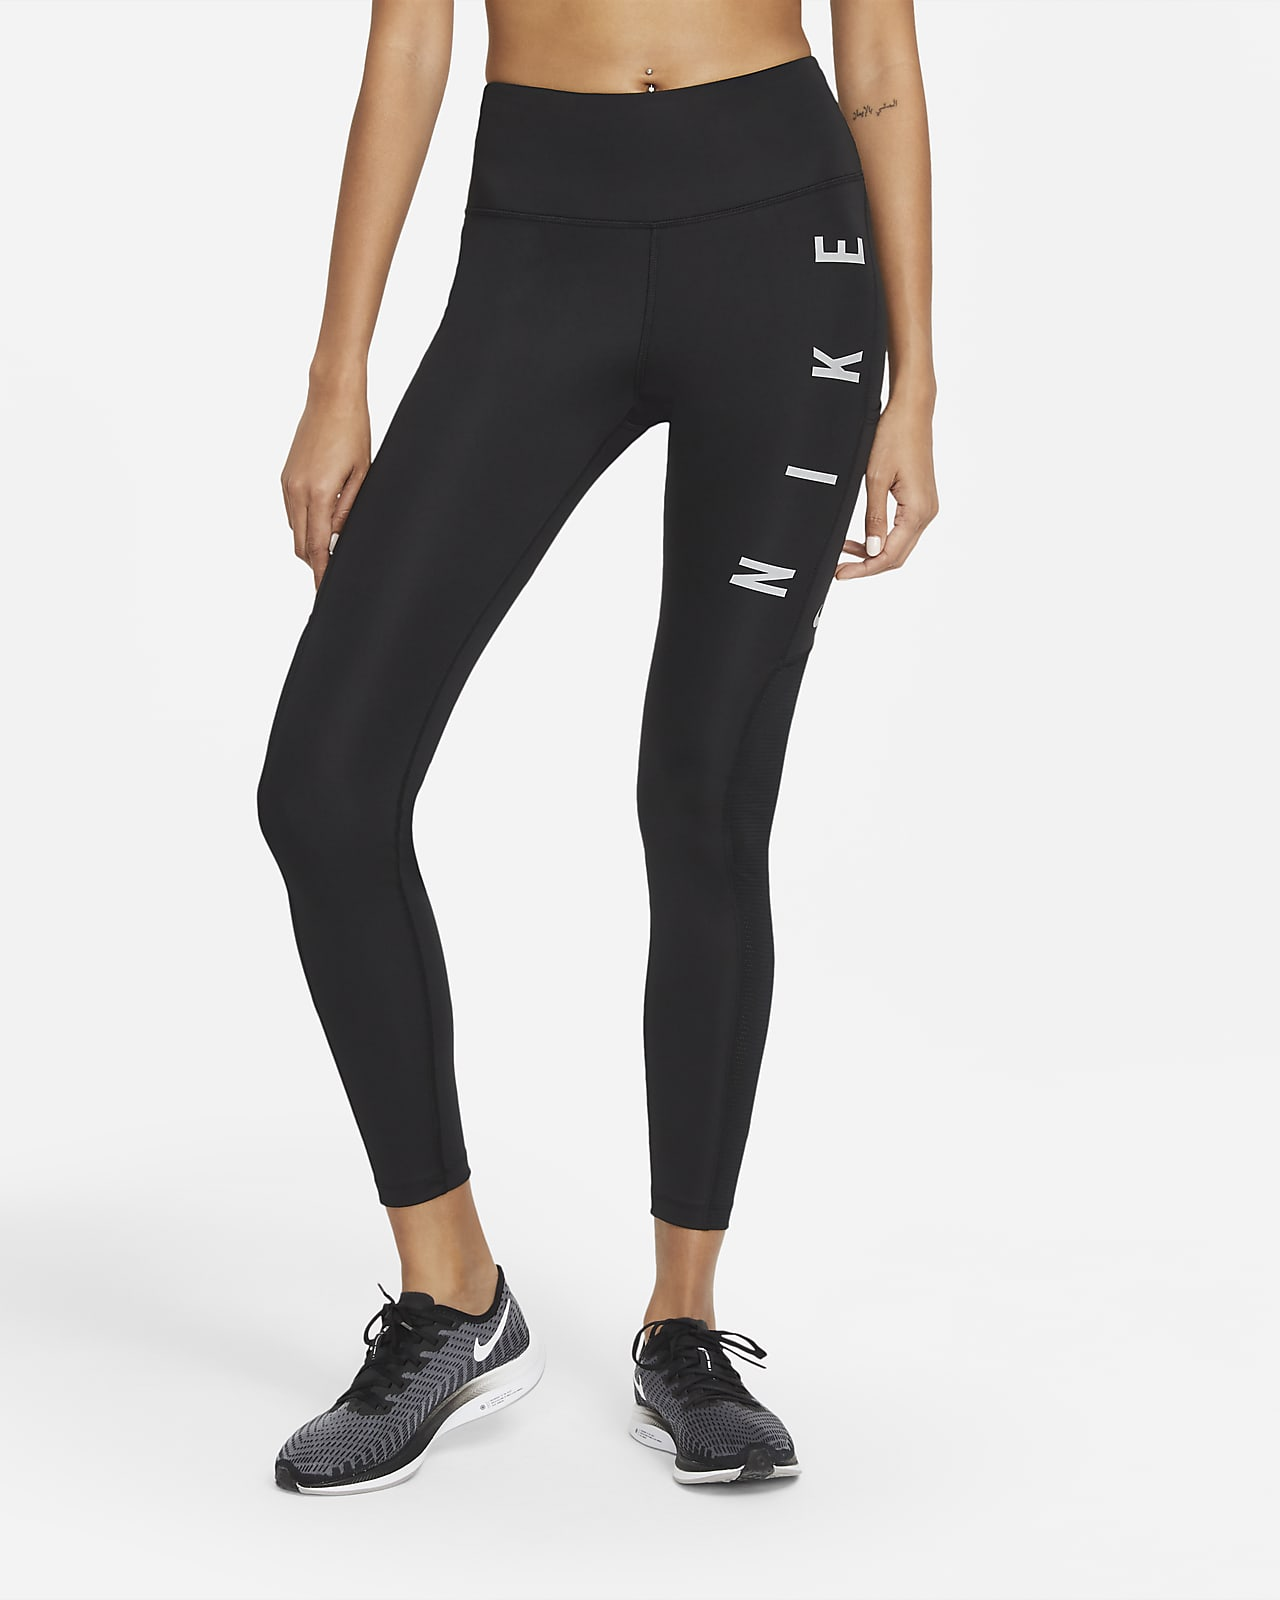 Nike Epic Fast Run Division Hardlooptights voor dames